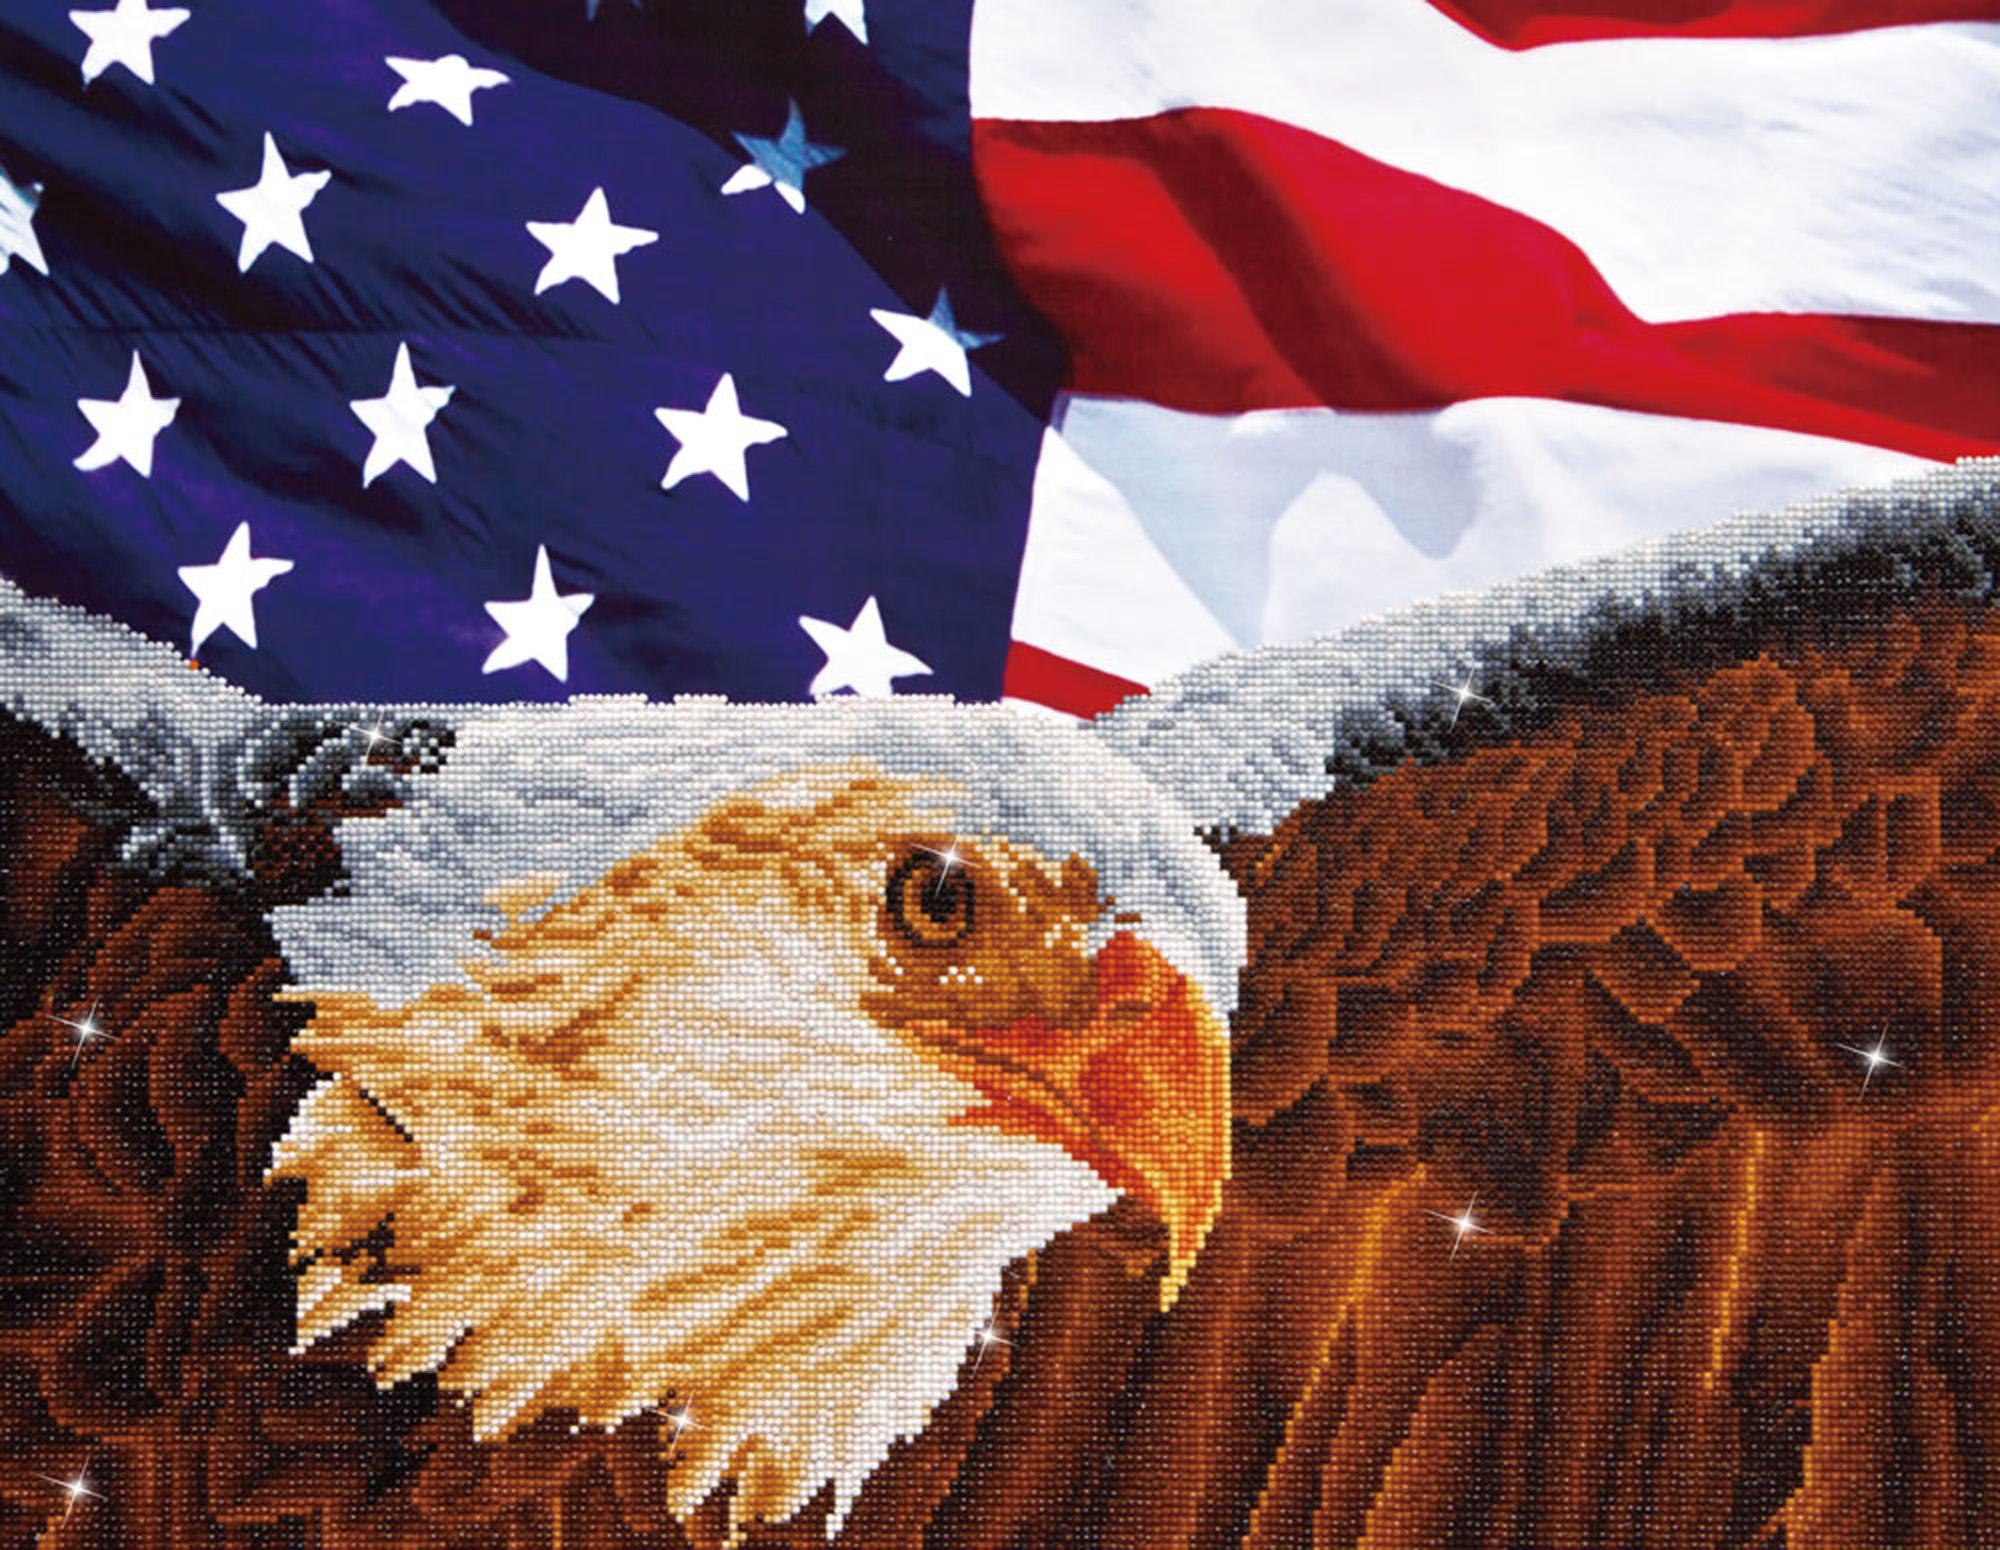 Tablou cu diamante - Vultur și drapel american, 56 x 71 cm imagine edituradiana.ro